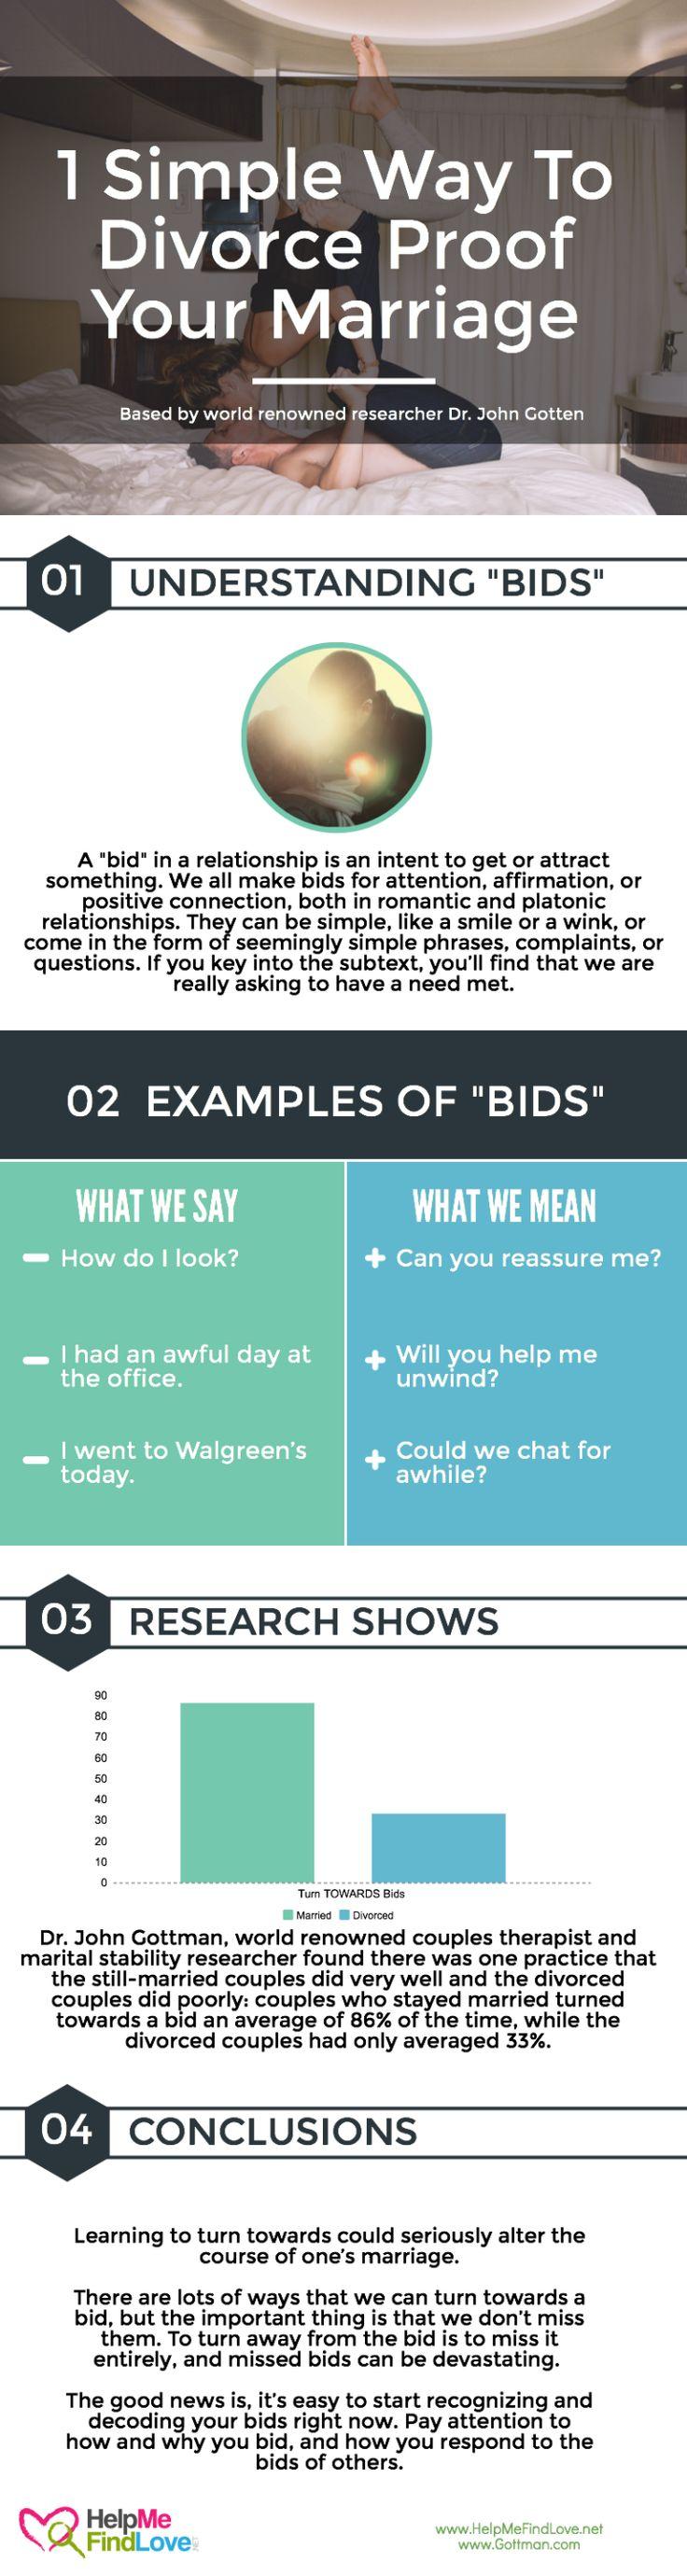 Gottman Research Shows Bids Help Divorce Proof Your